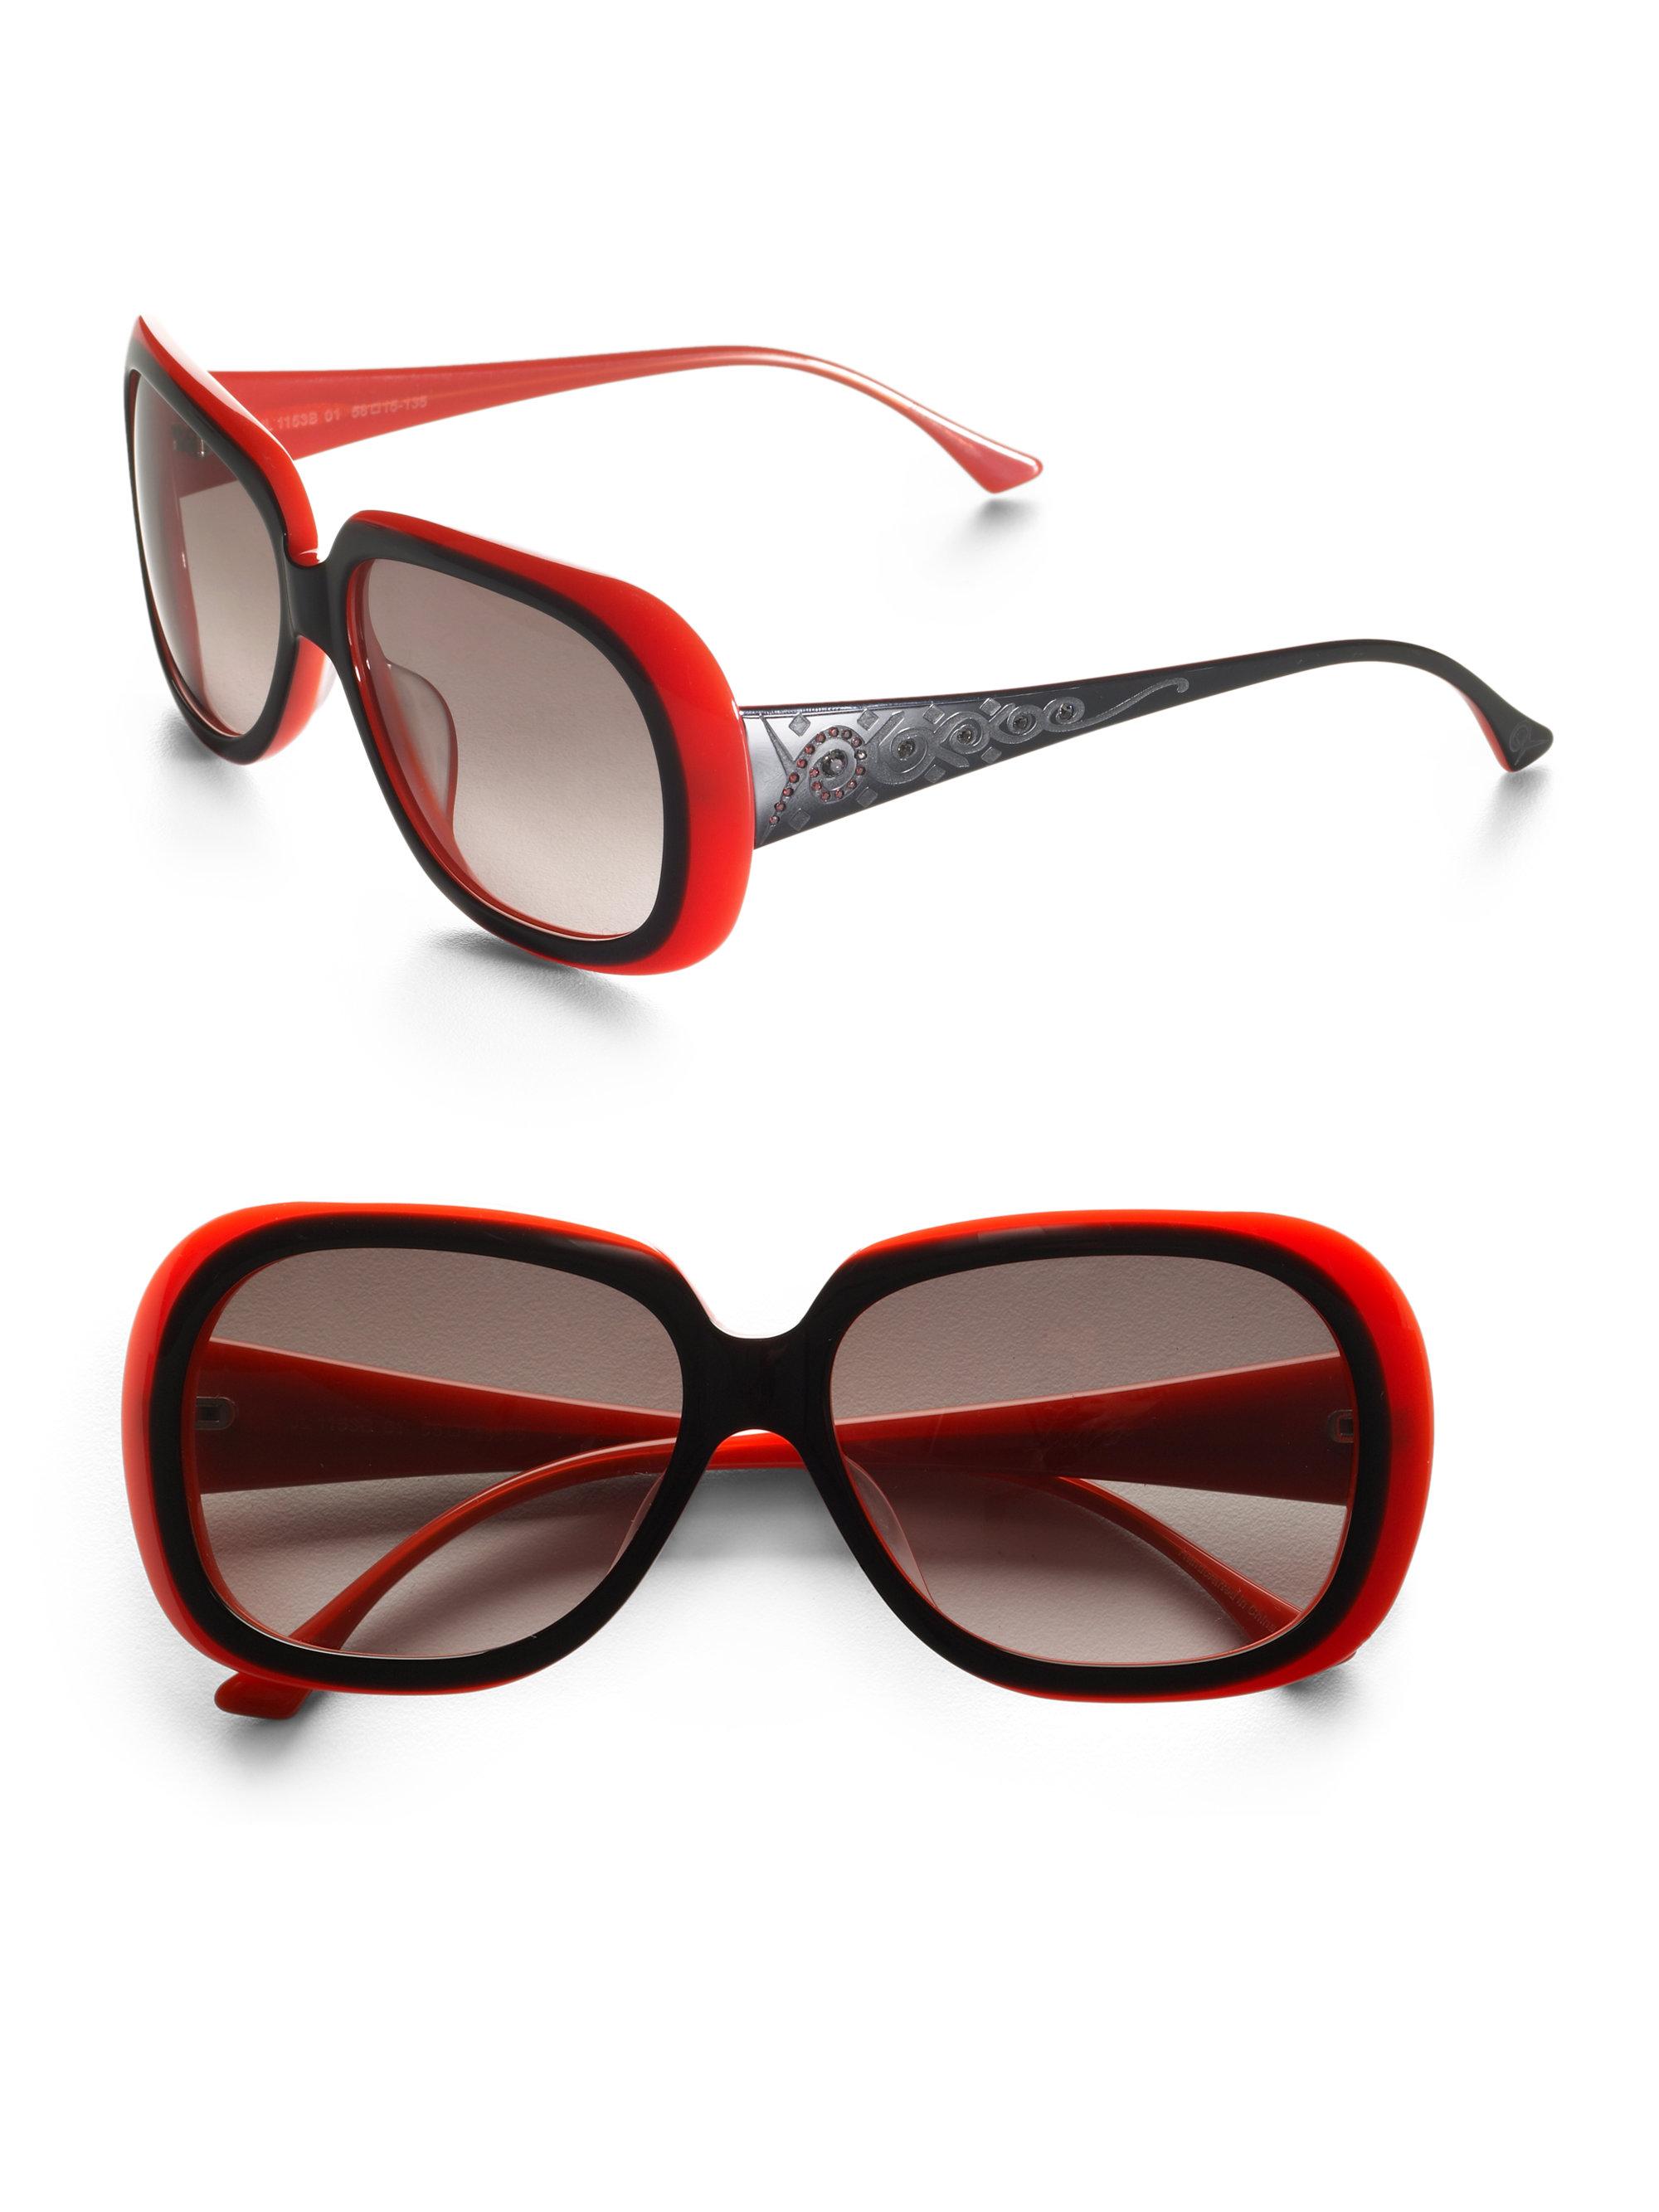 judith leiber aztec acetate sunglasses in coral lyst